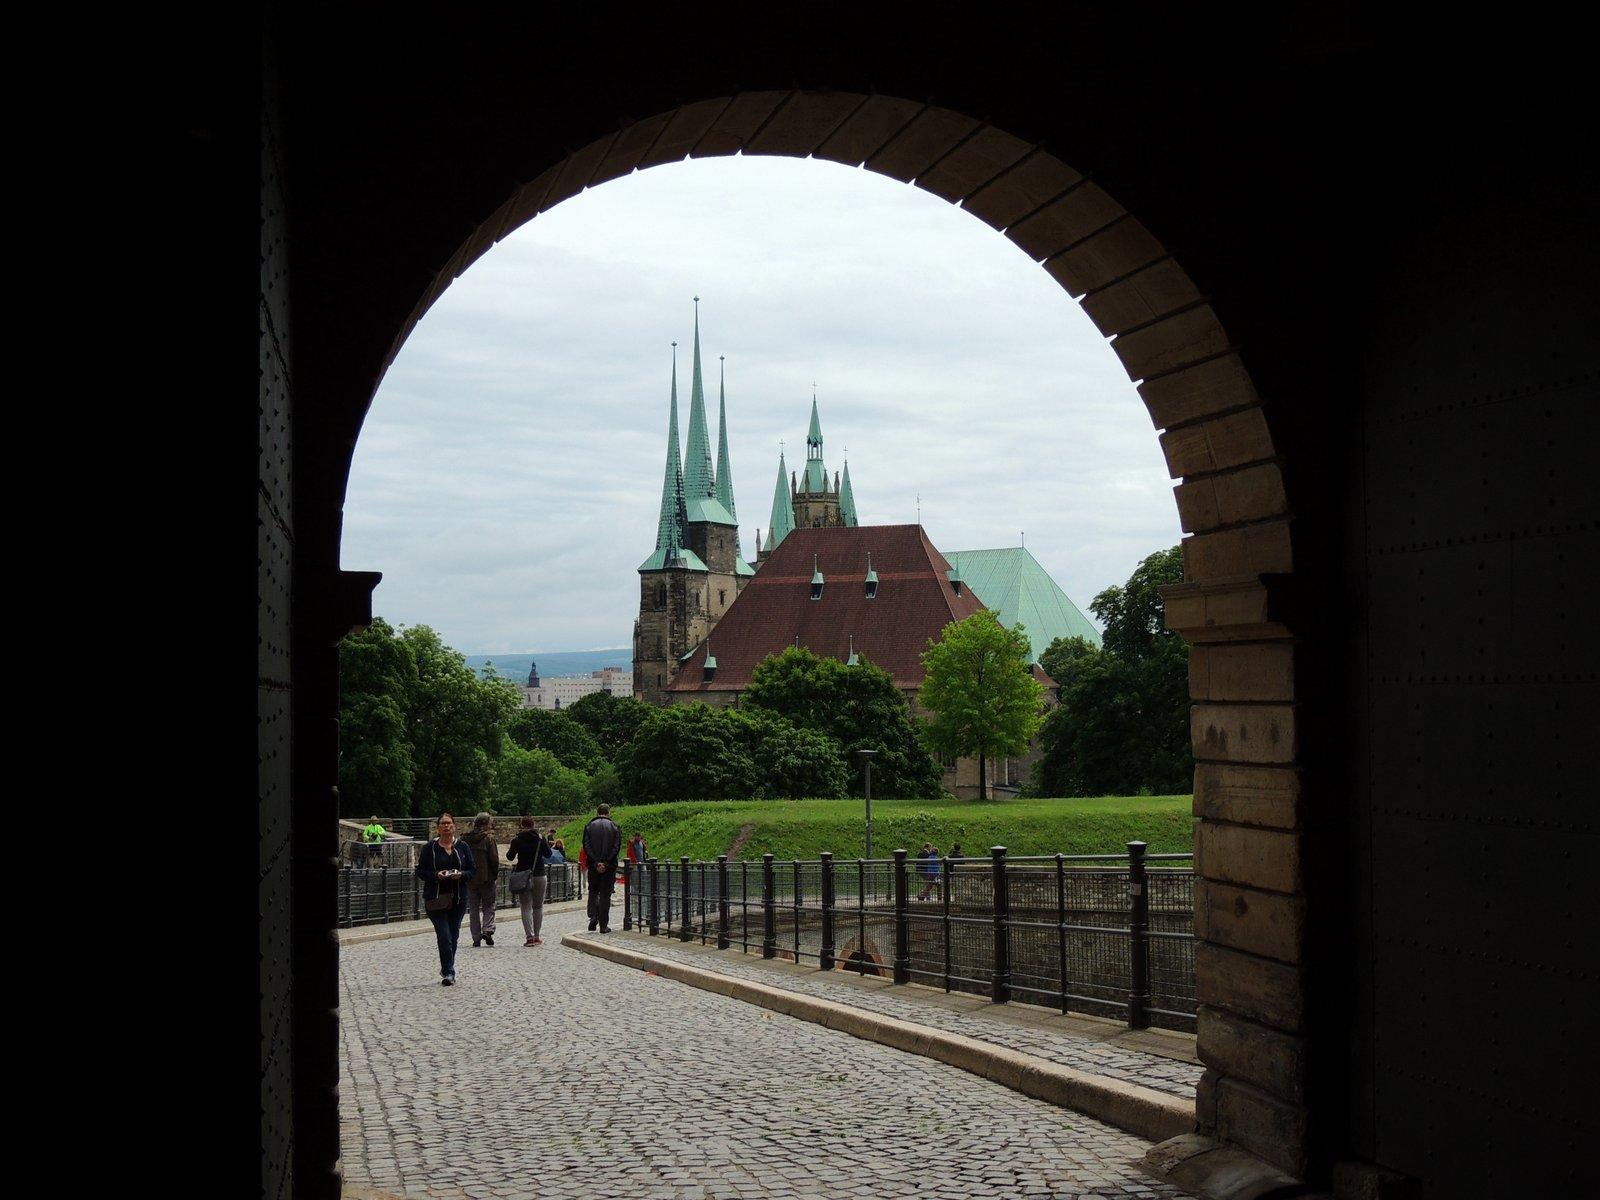 Dom zu Erfurt / Thüringen